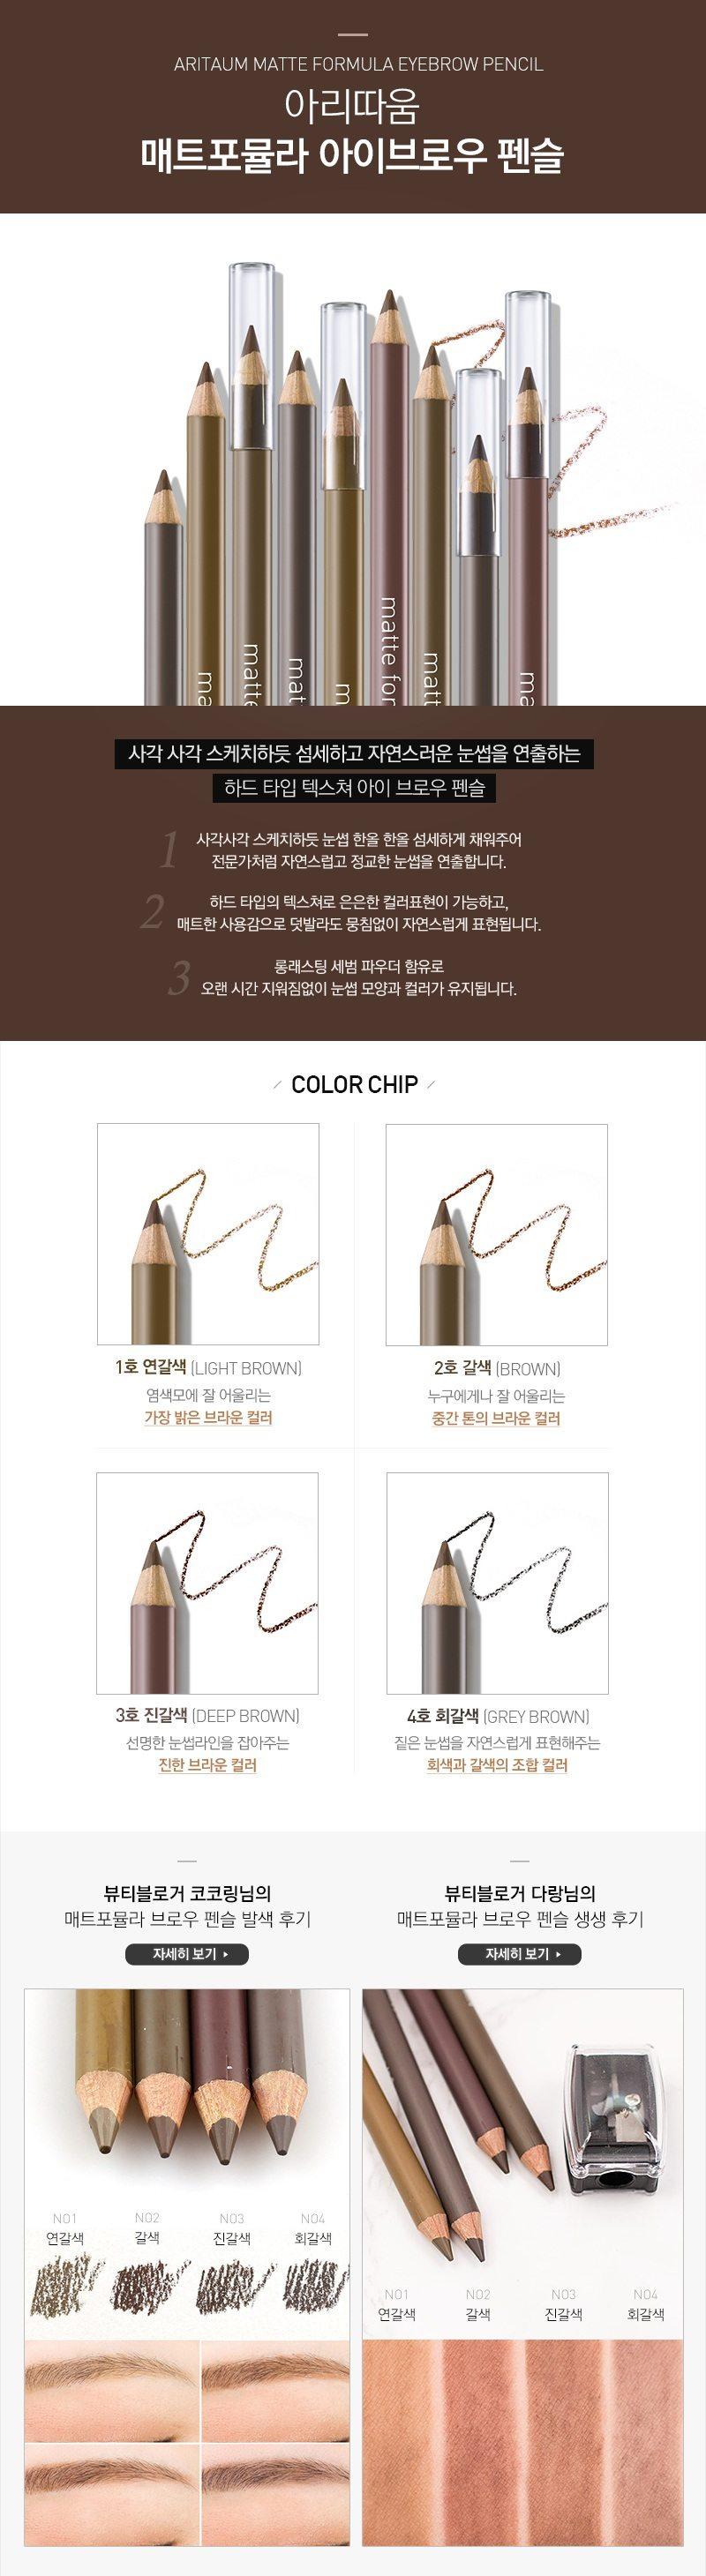 Aritaum Matte Formula Eye Brow Pencil korean cosmetic makeup product online shop malaysia india taiwan1